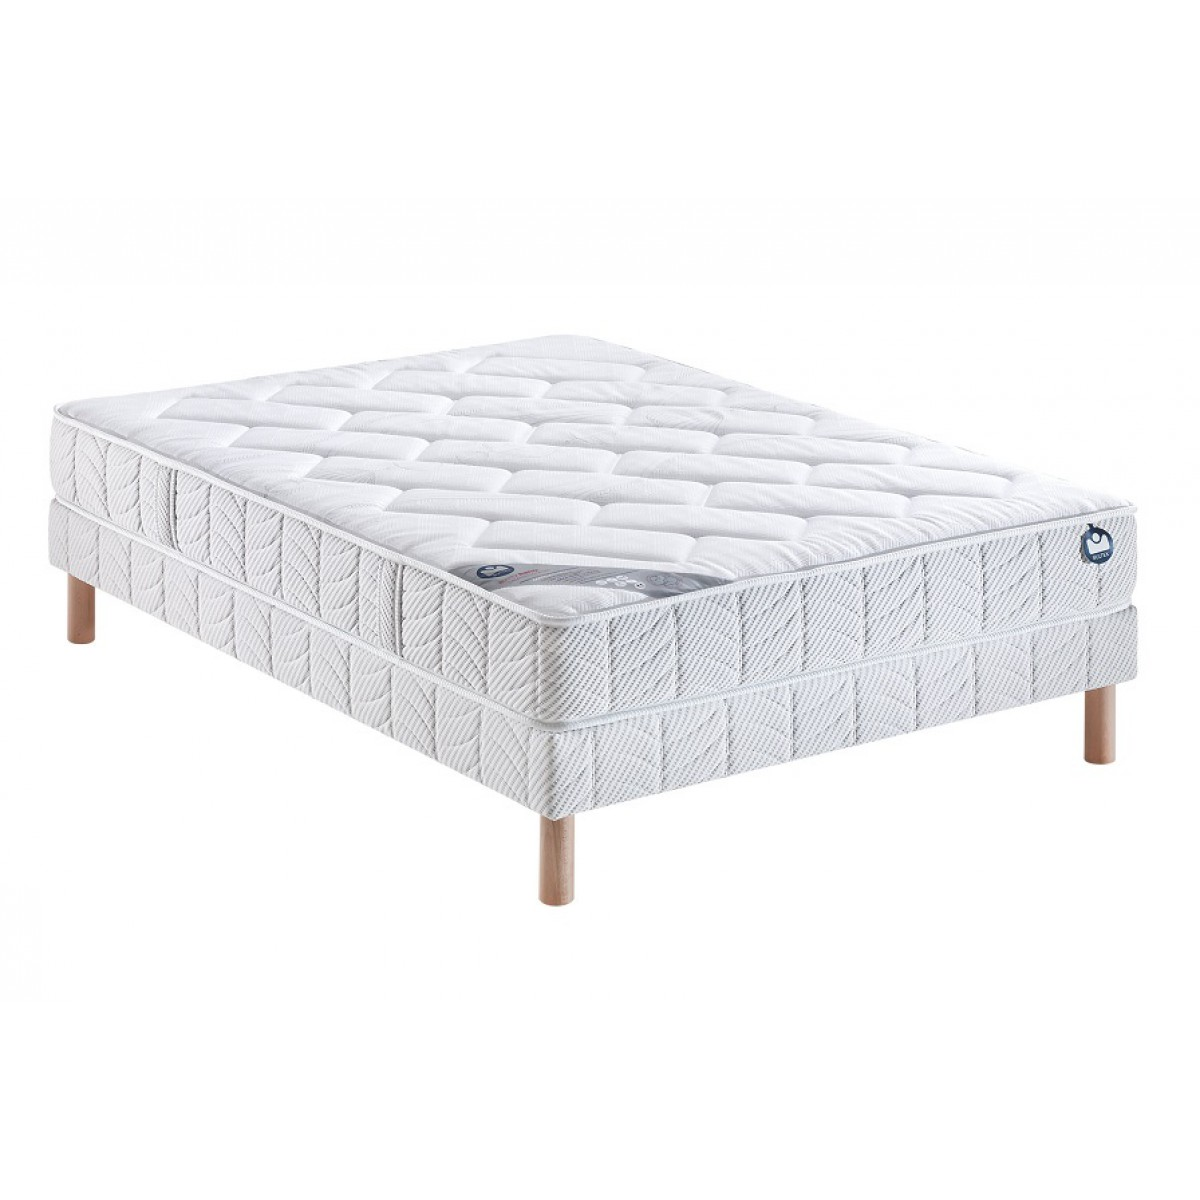 bultex ensemble nano i novo 150 120x190. Black Bedroom Furniture Sets. Home Design Ideas